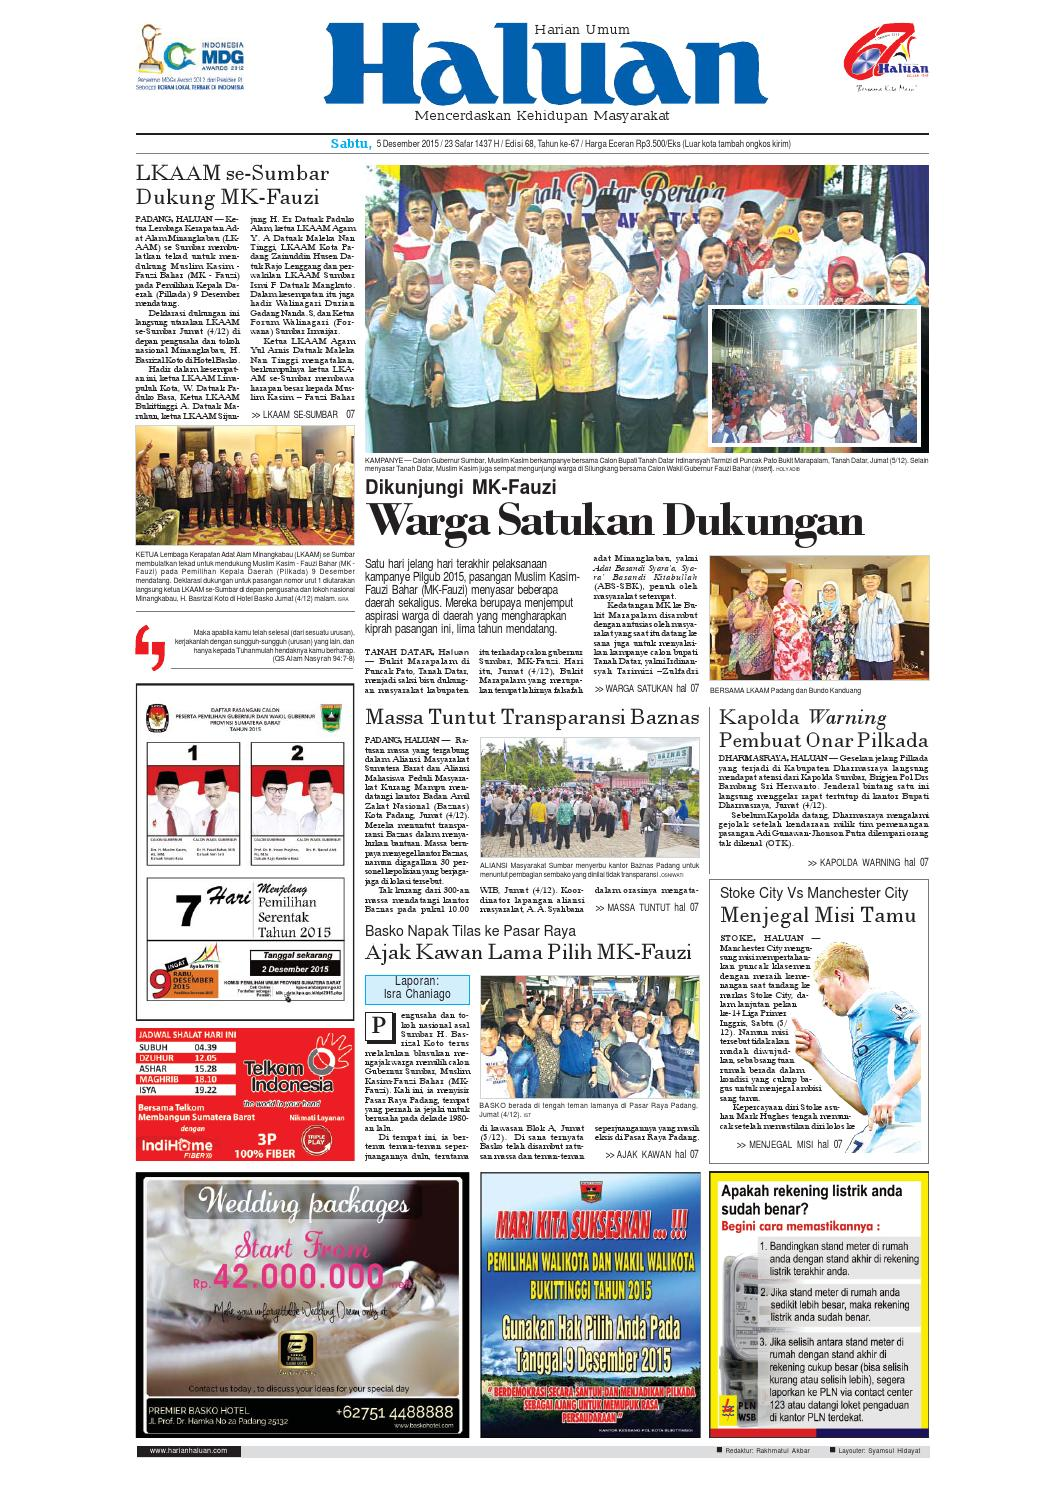 Haluan 05 Desember 2015 By Harian Issuu Bri Produk Ukm Bumn Kain Doby Motif Bunga